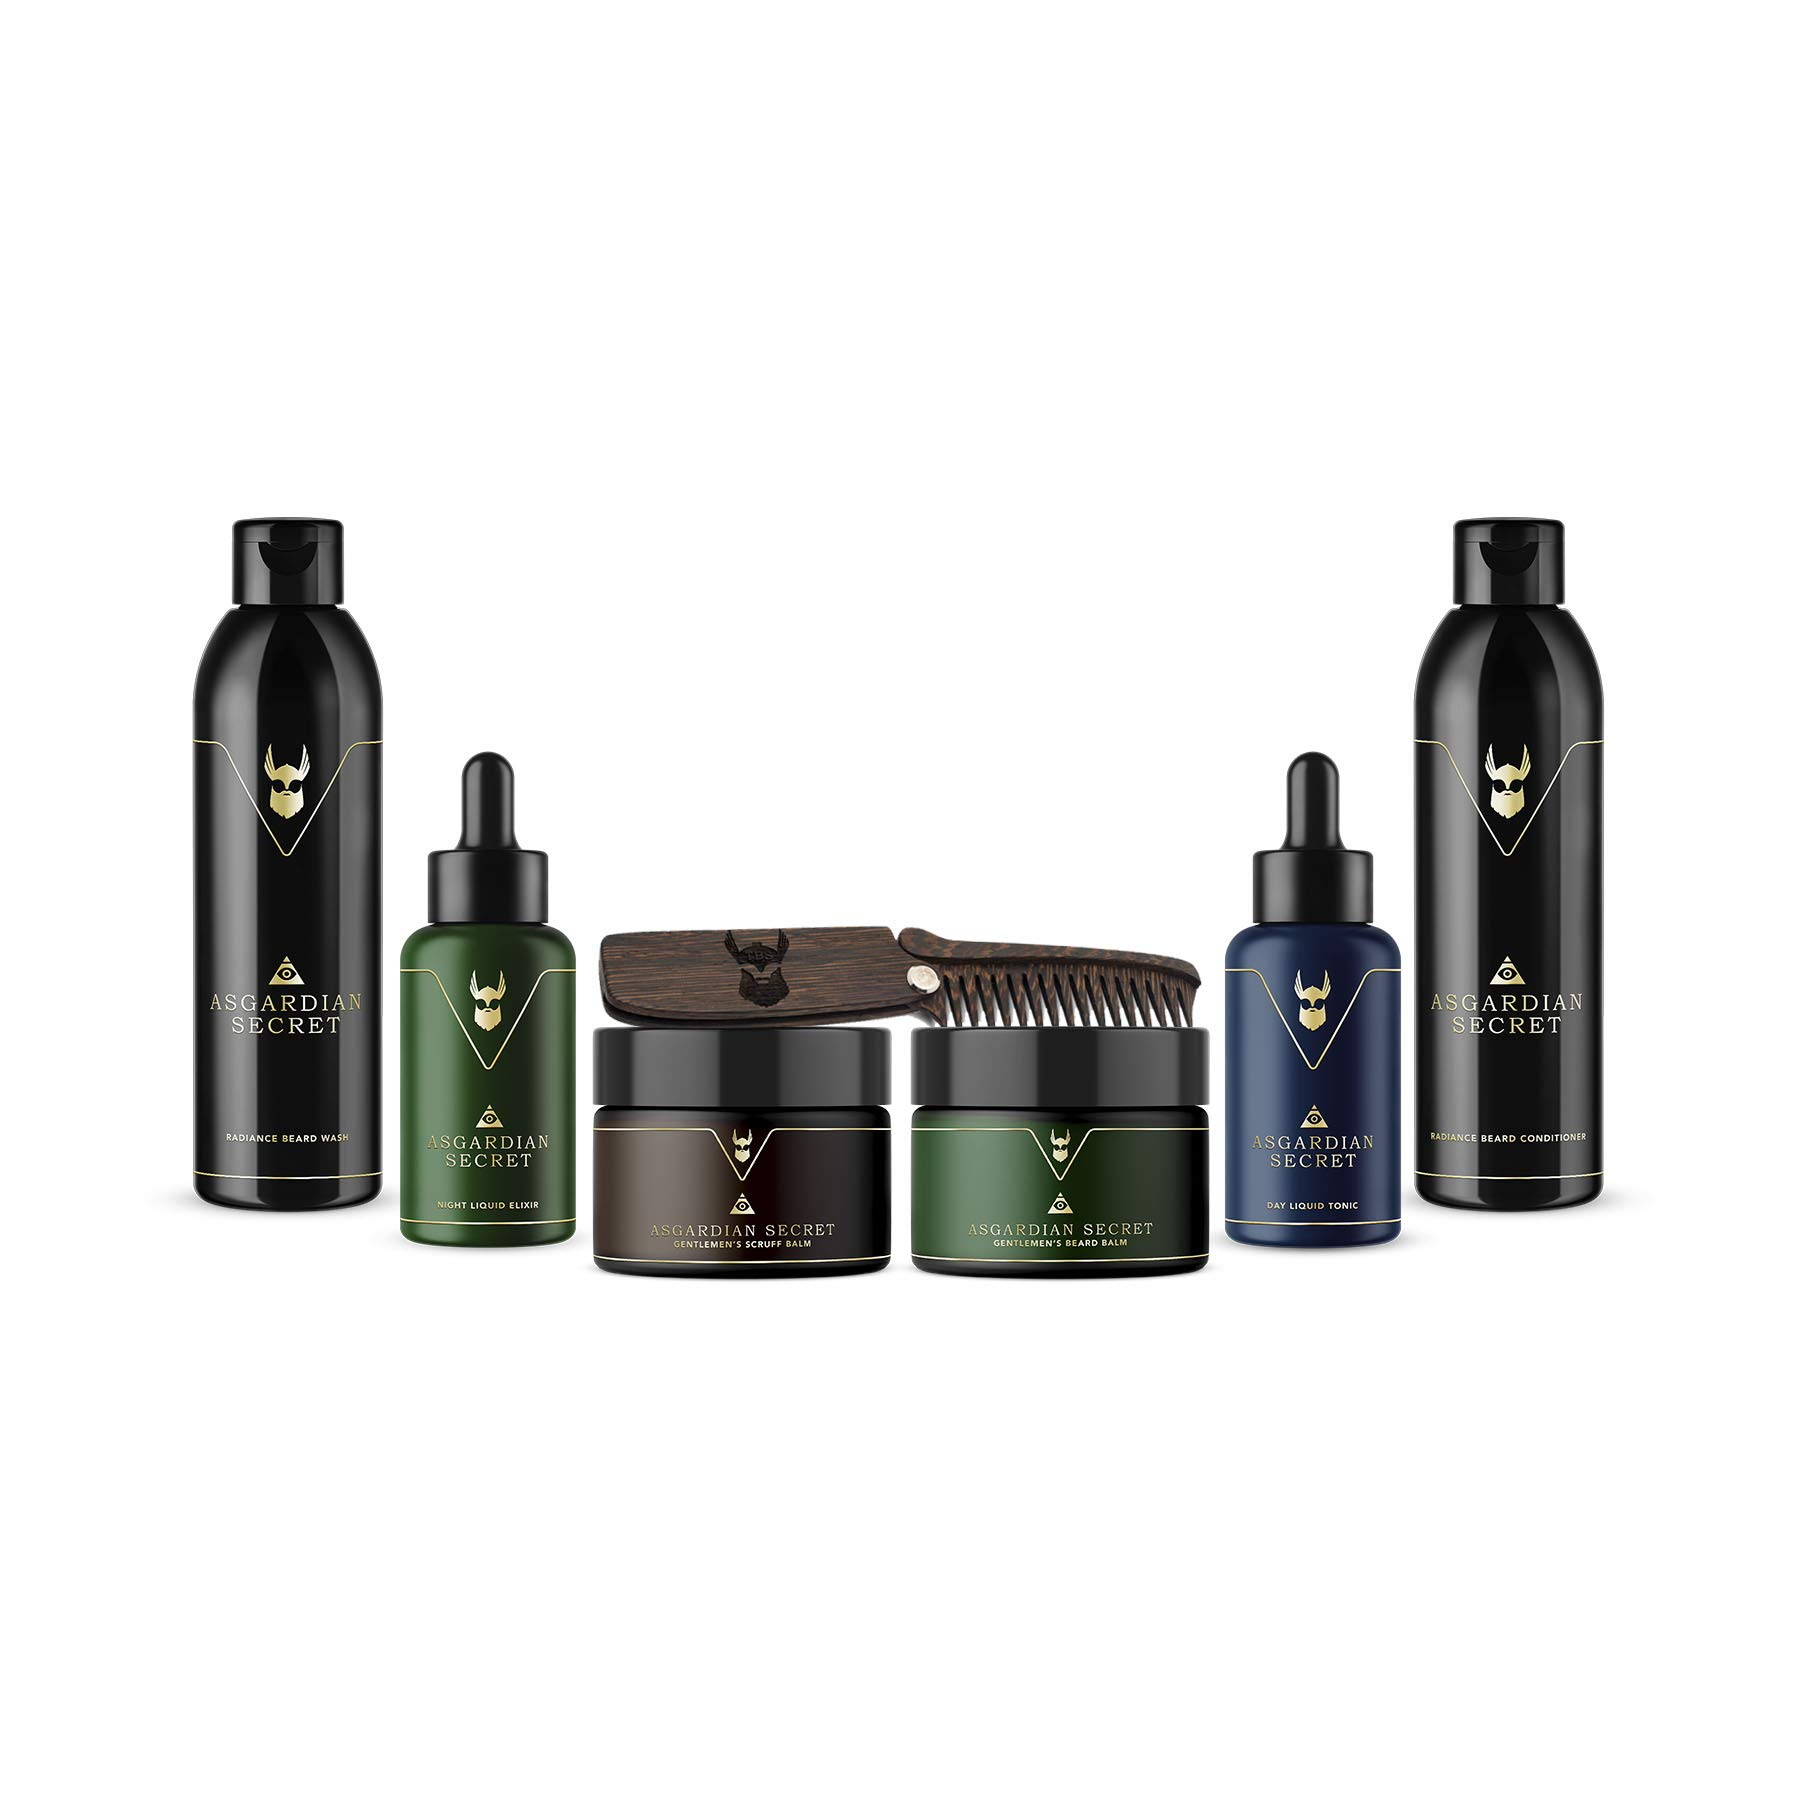 The Beard Struggle Ultimate Kit Asgardian Secret - for Men & Beard Care W/Beard Wash/Shampoo/Conditioner/Night oil/Day oil,100% Natural & Organic